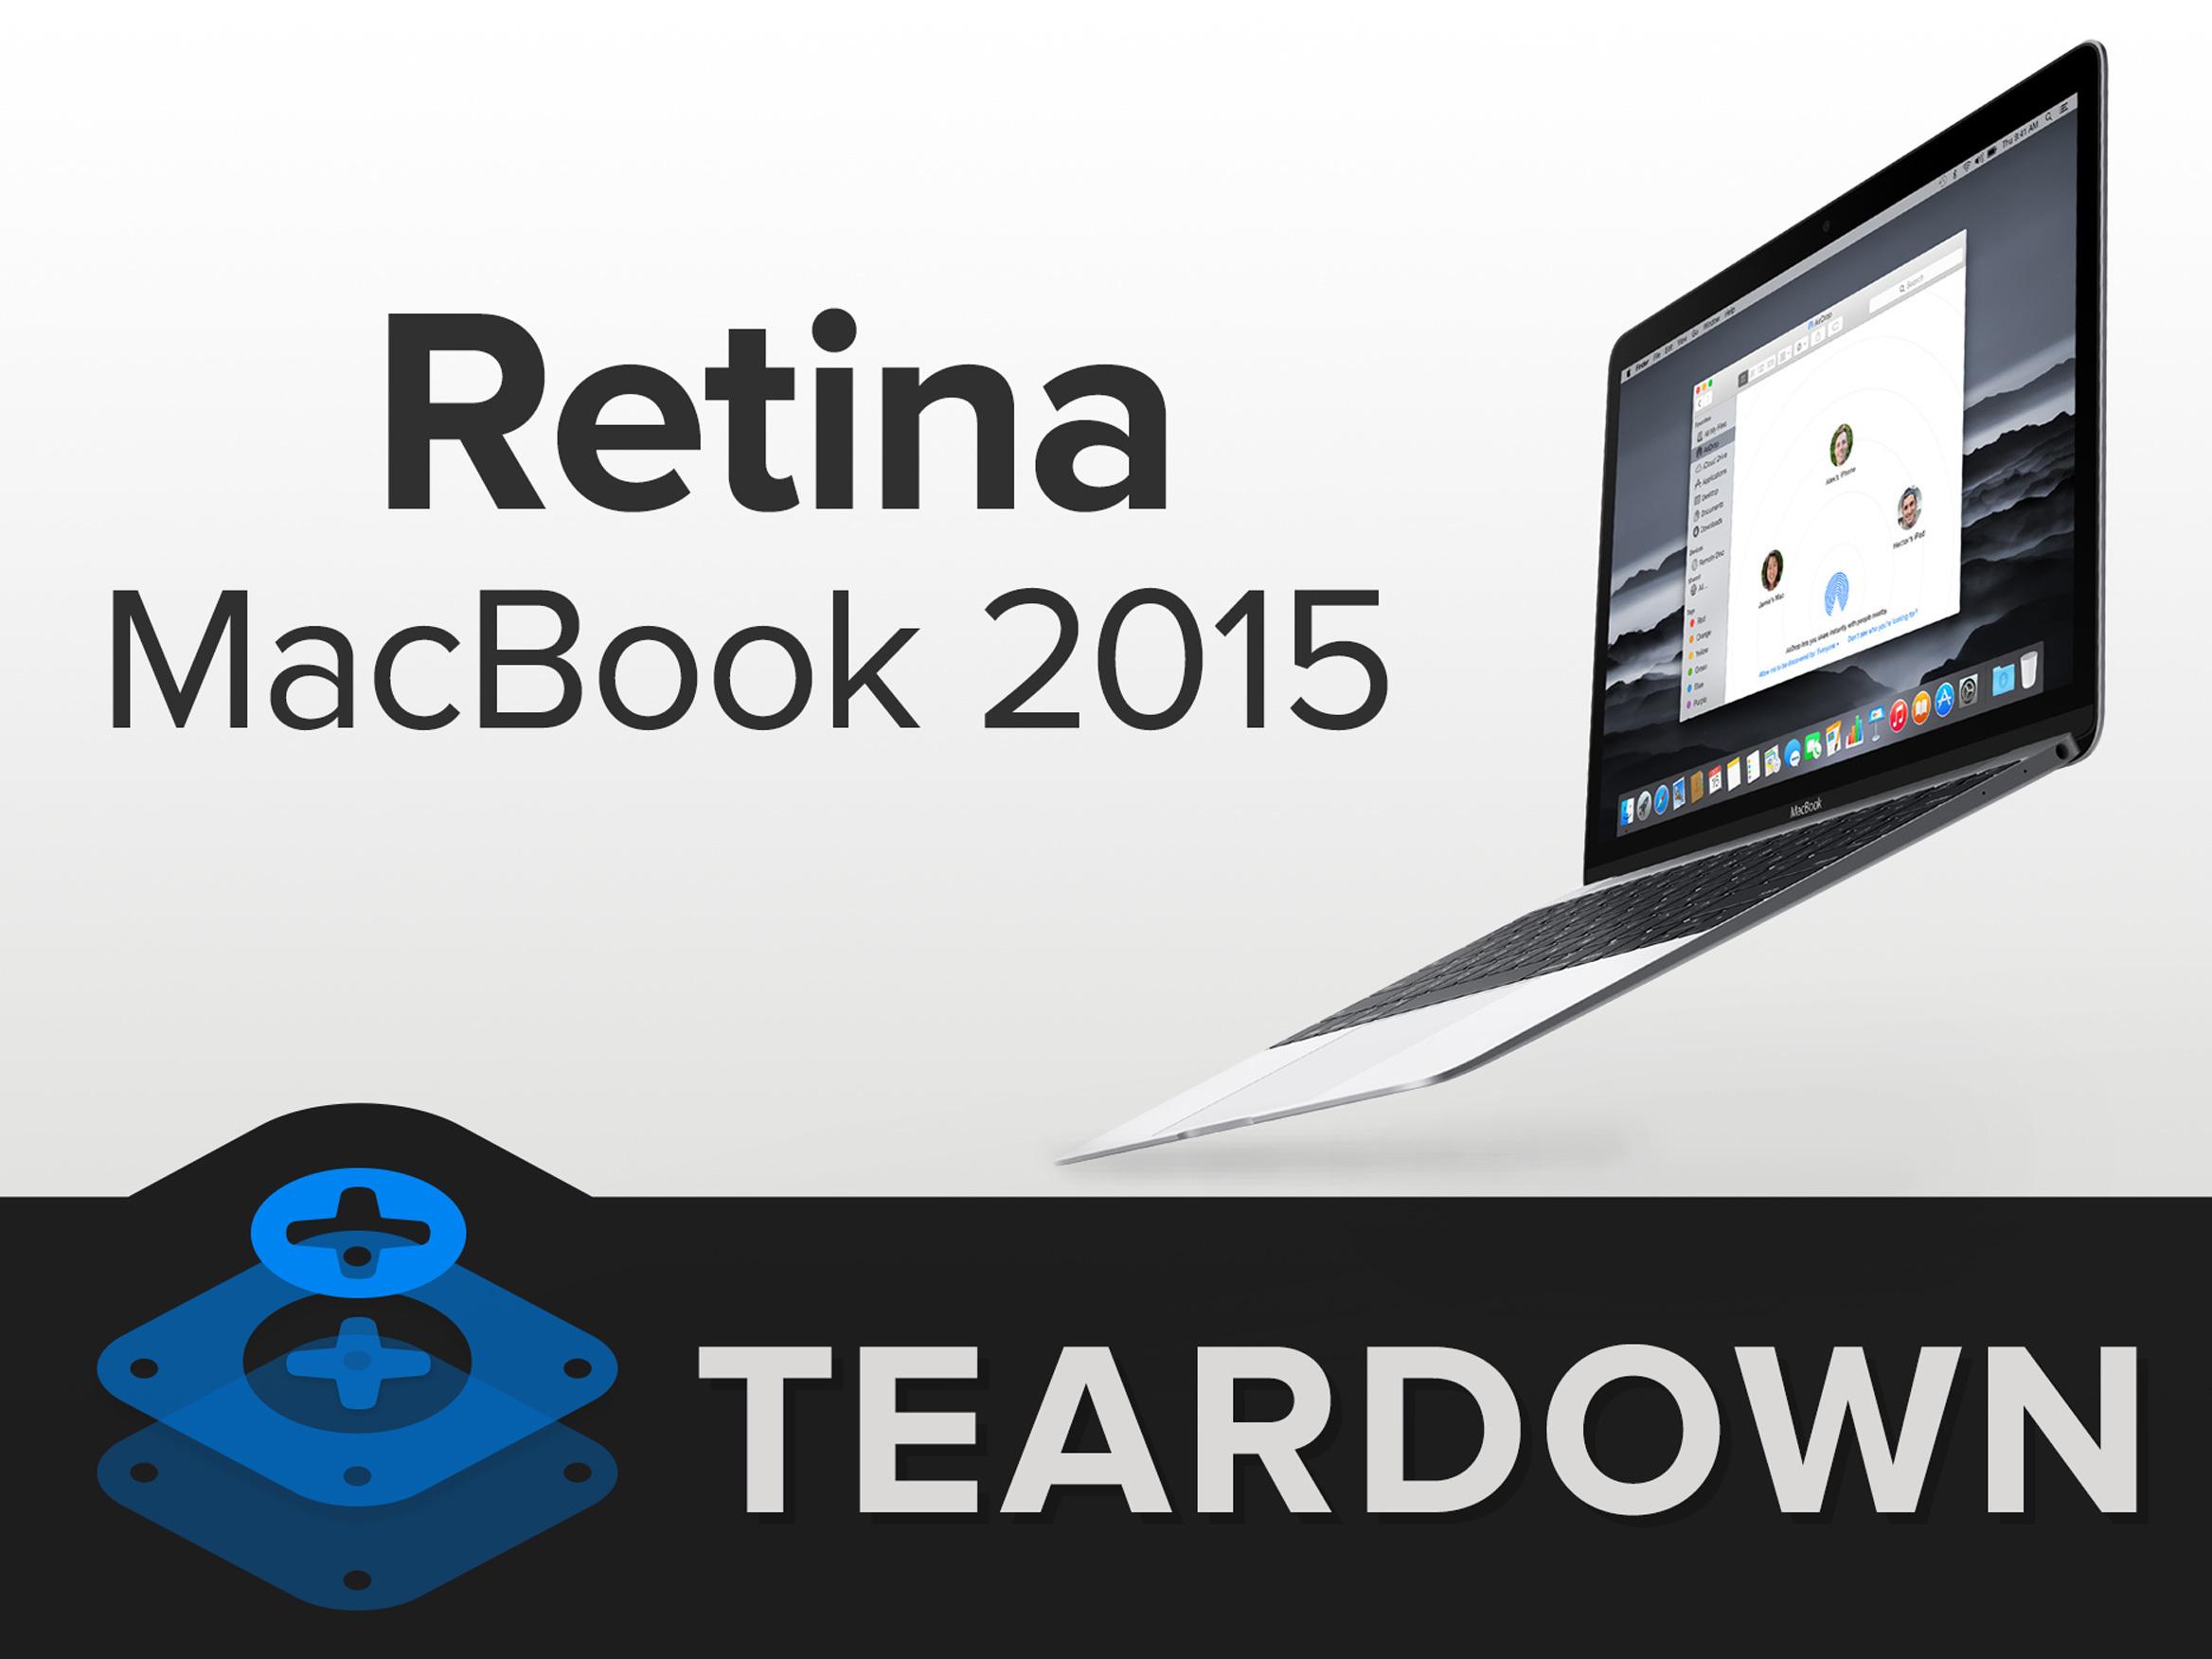 Retina Macbook 2015 Teardown Ifixit Apple Usb Wiring Diagram Further Wires Nest